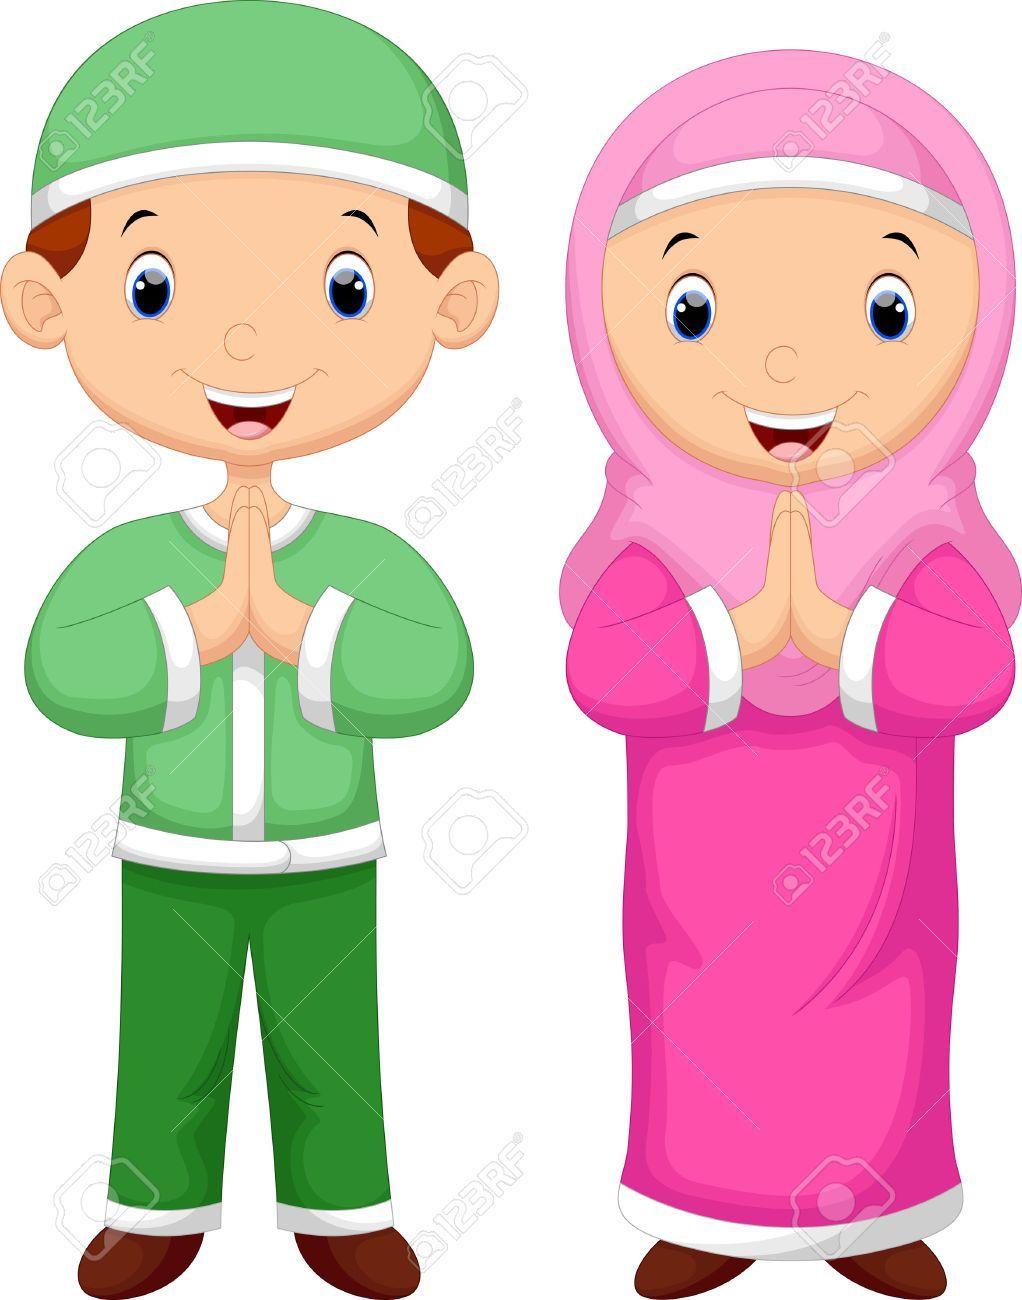 Gambar Kartun Anak Muslim Vector | Kartun, Gambar karakter ...